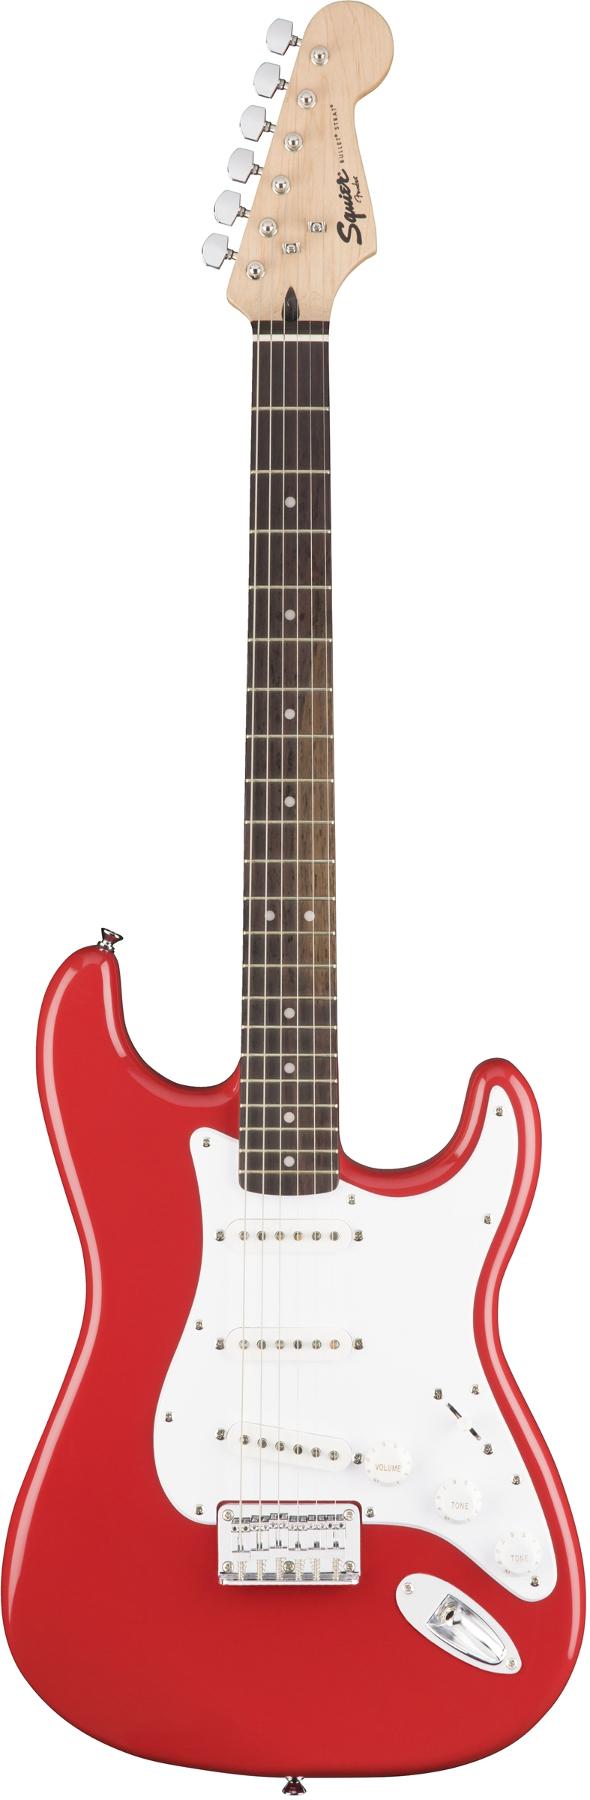 squier fender bullet strat ht electric guitar with rosewood fingerboard full compass. Black Bedroom Furniture Sets. Home Design Ideas